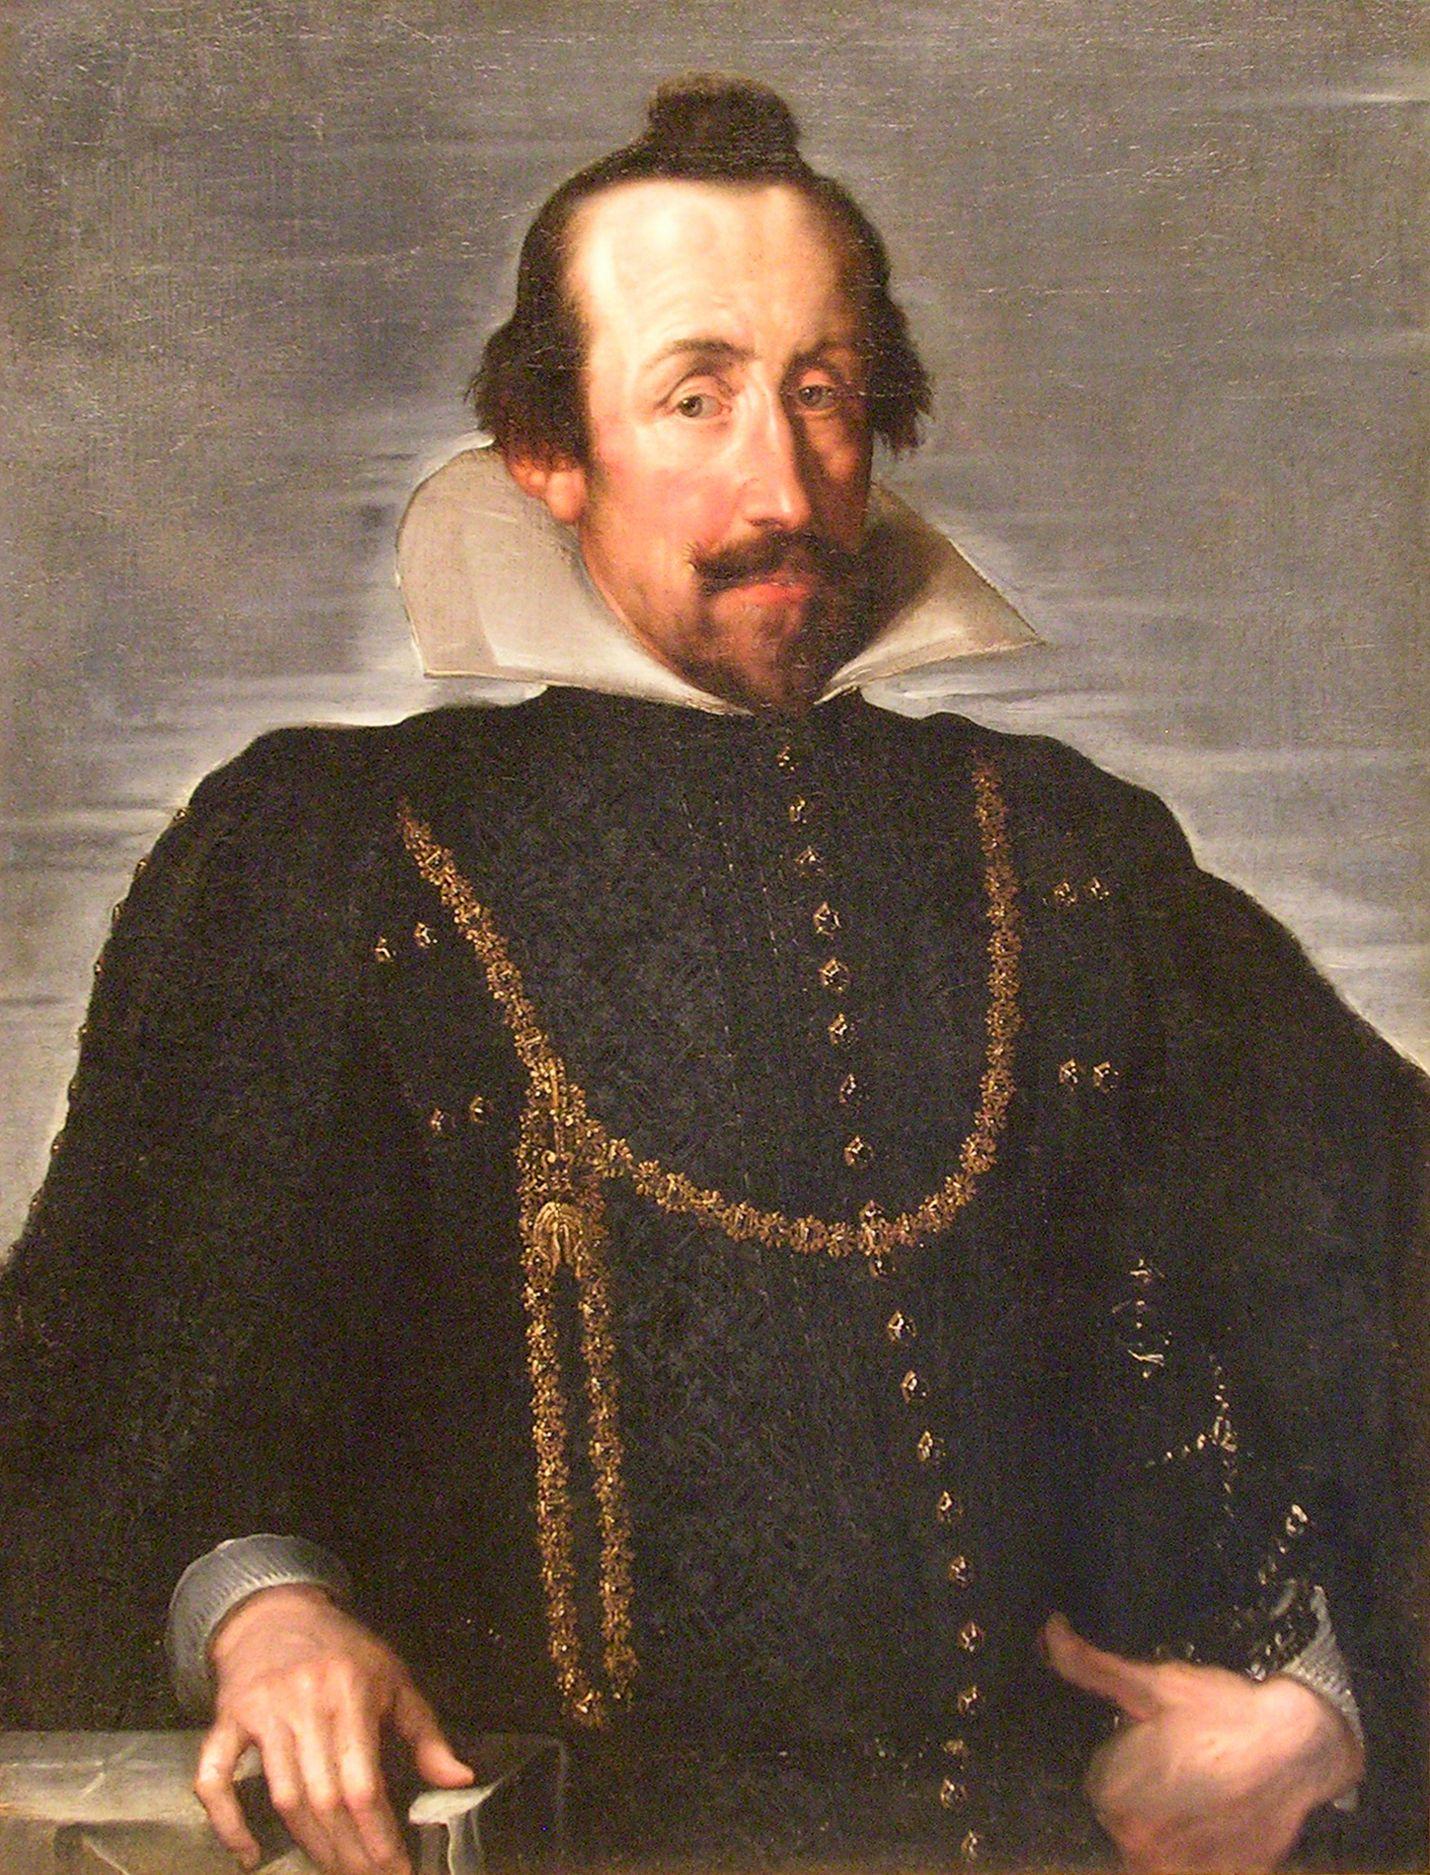 Follower of Pieter Paul Rubens (1577-1640), The Duke Wolfgang Wilhem de Pfalz-Neuburg, Museo Nacional de Bellas Artes de Cuba